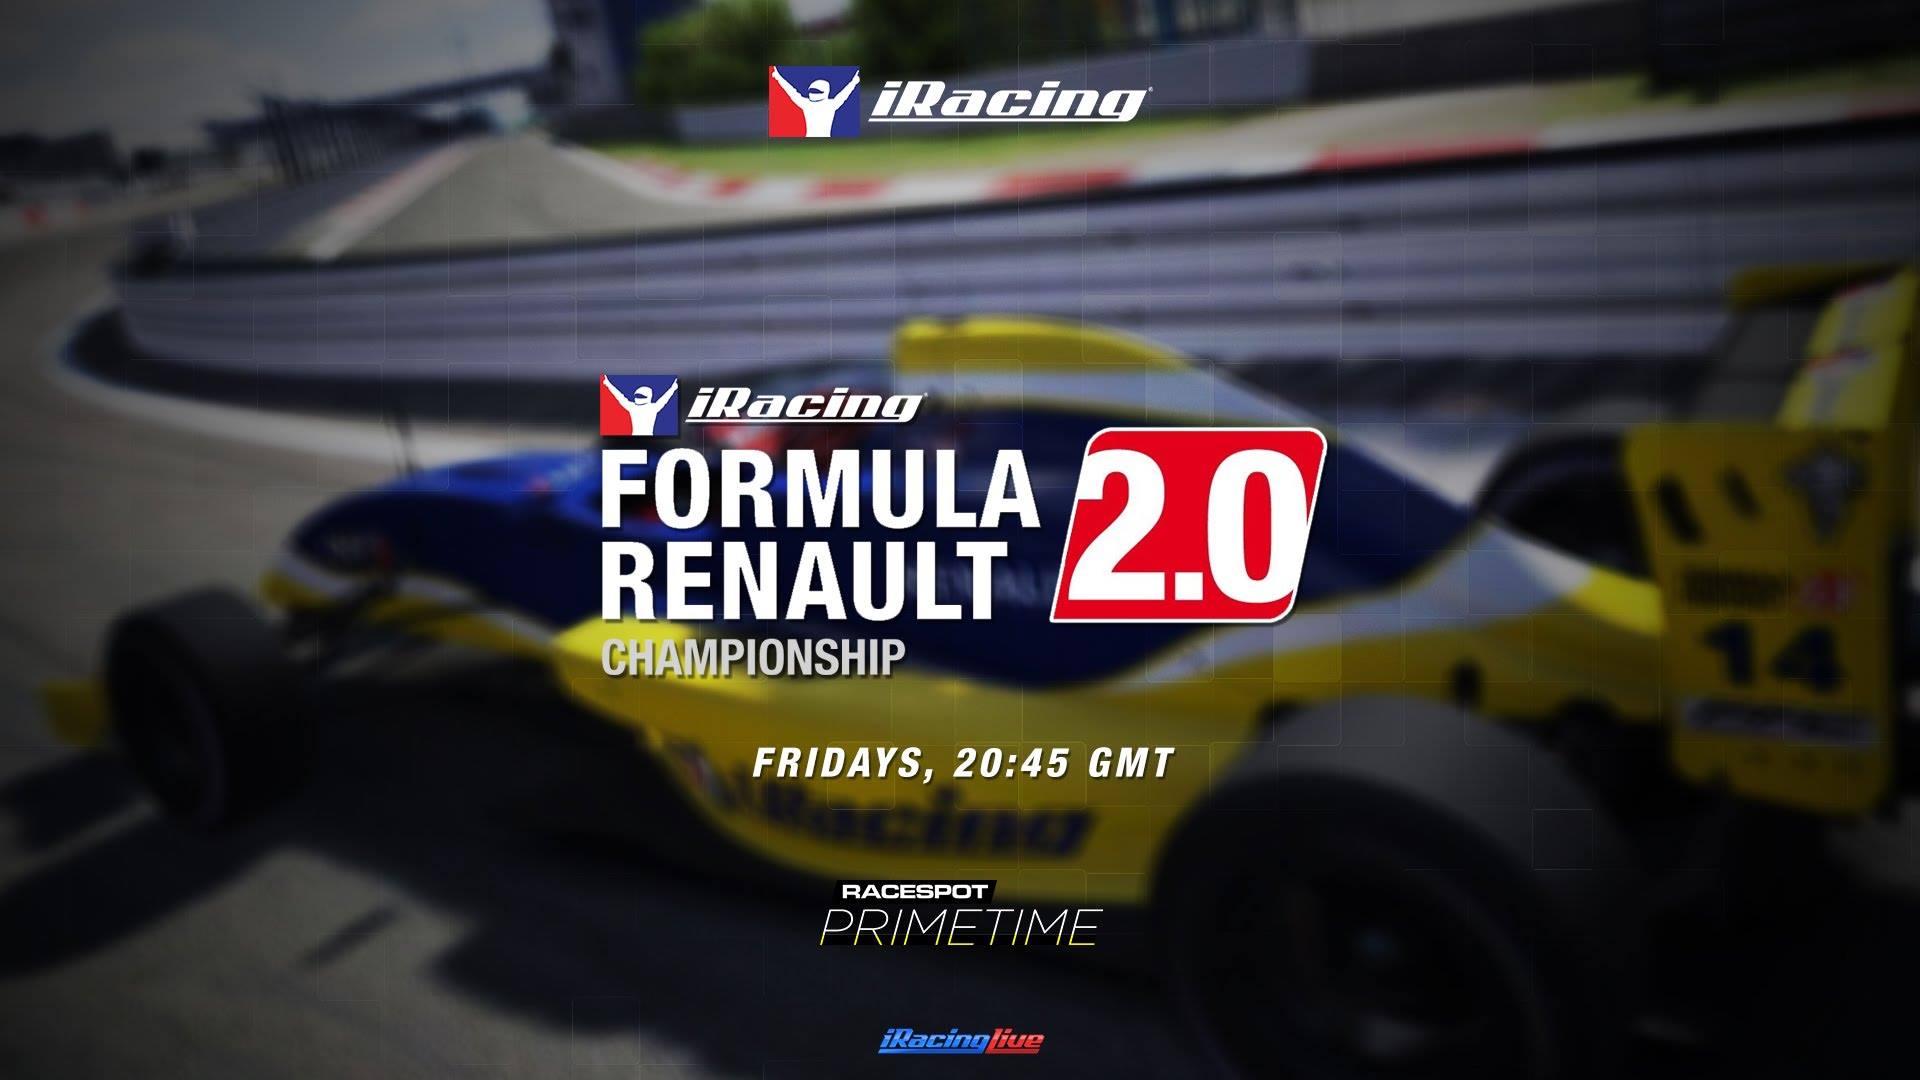 Formula Renault 2.0 Championship